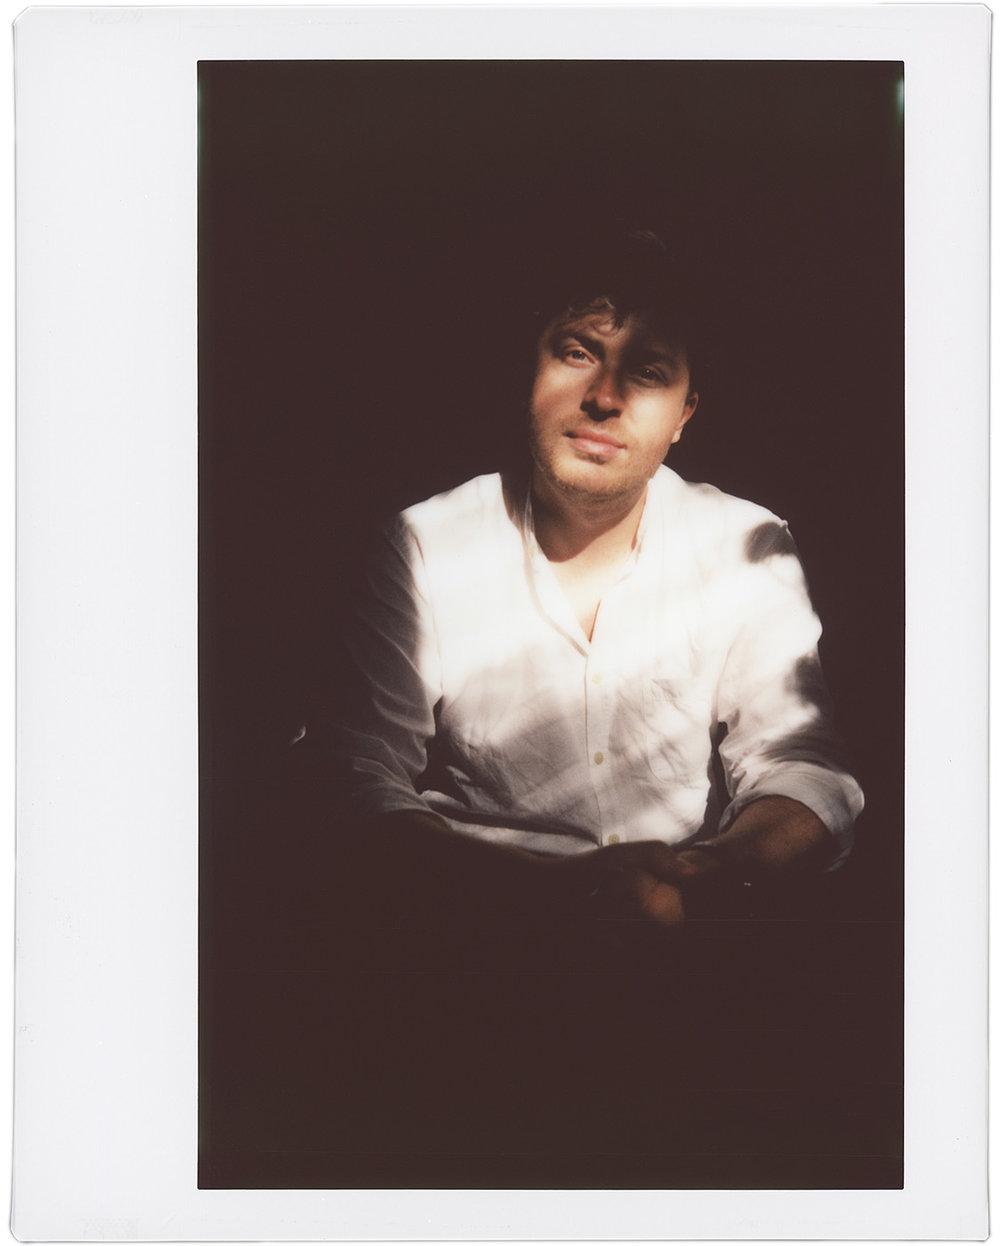 Jack Milas, Multi-instrumentalist, Singer & Songwriter (Australia/UK)